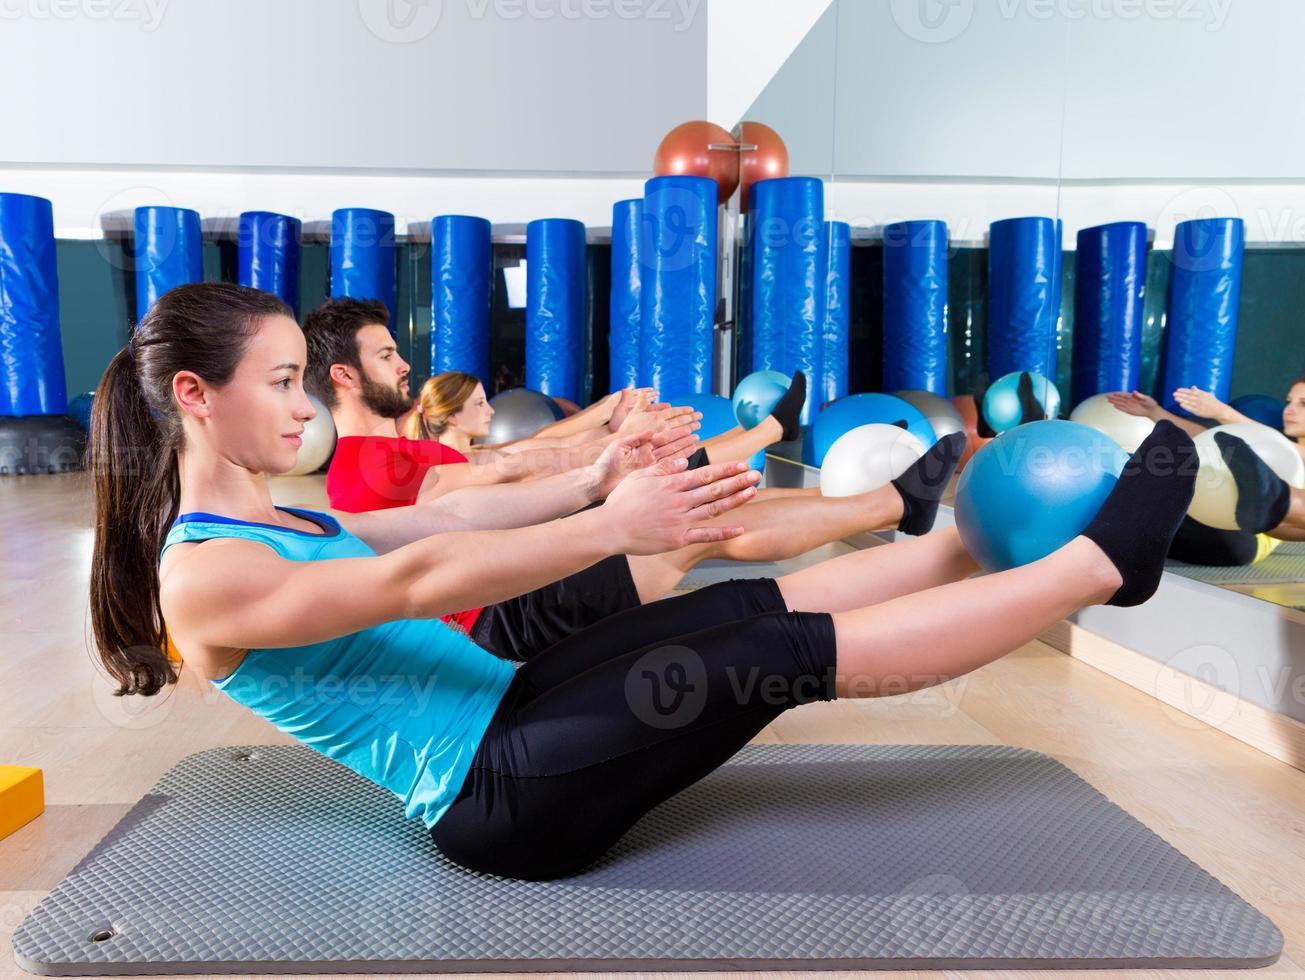 pilates softball l'esercizio teaser group in palestra foto